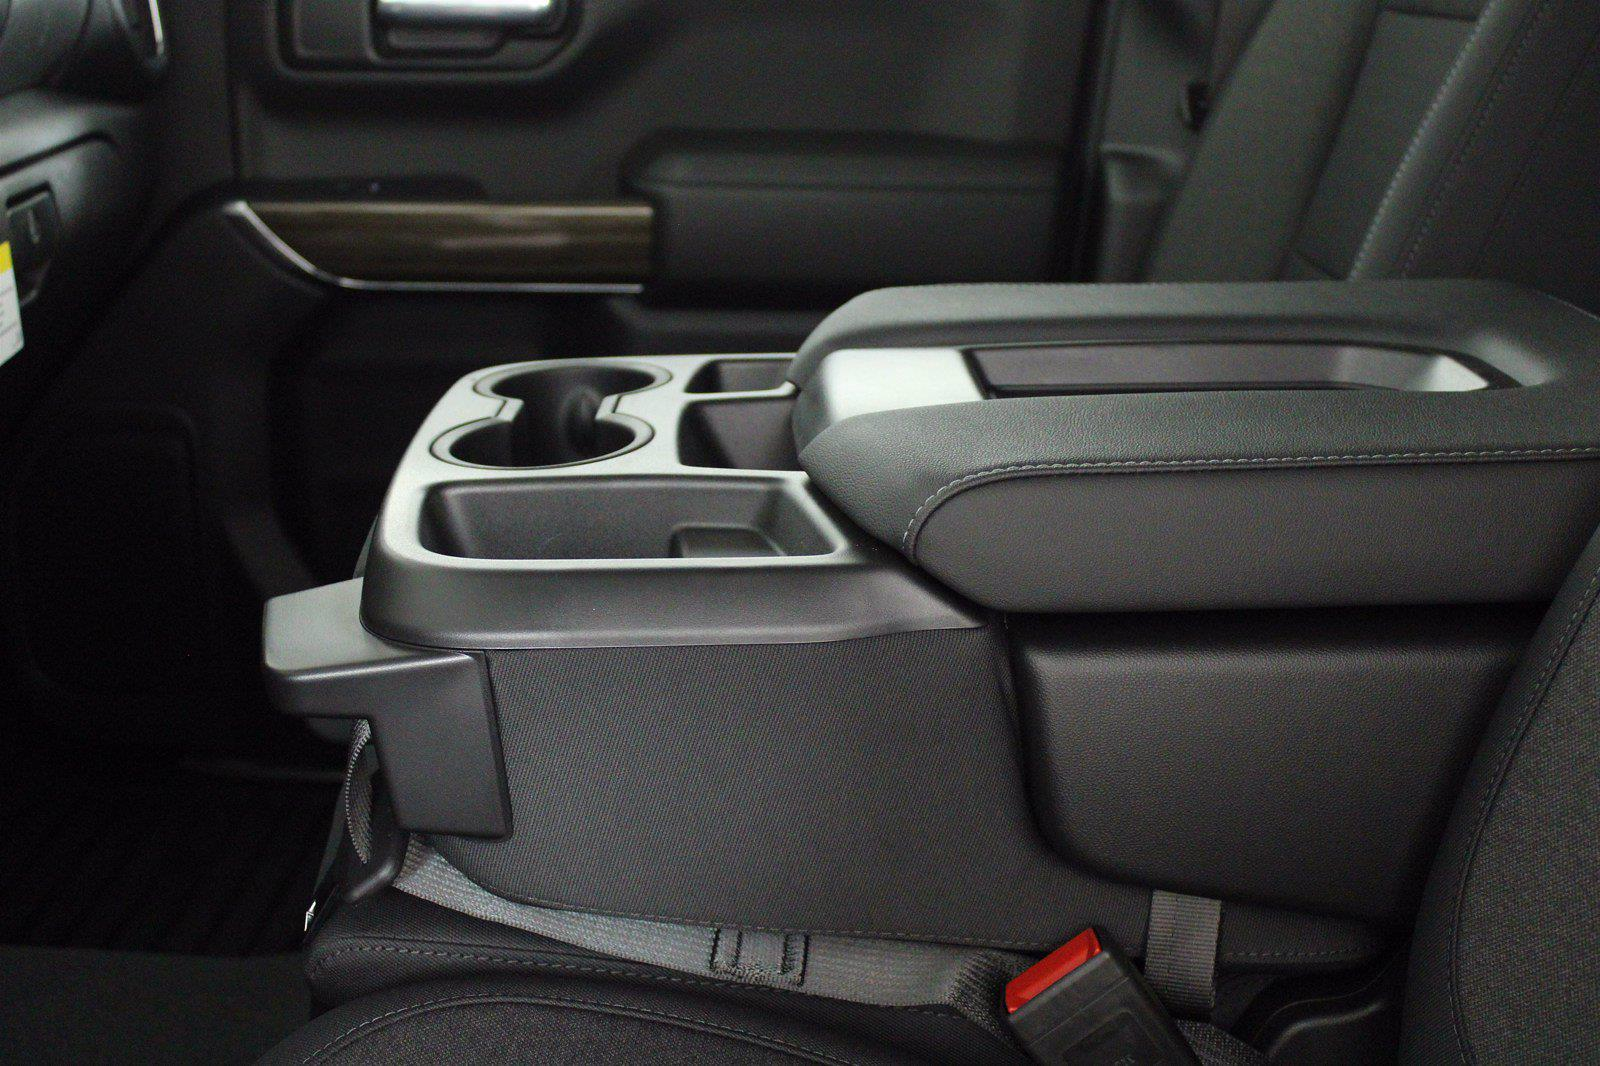 2021 Chevrolet Silverado 1500 Crew Cab 4x4, Pickup #D110907 - photo 13